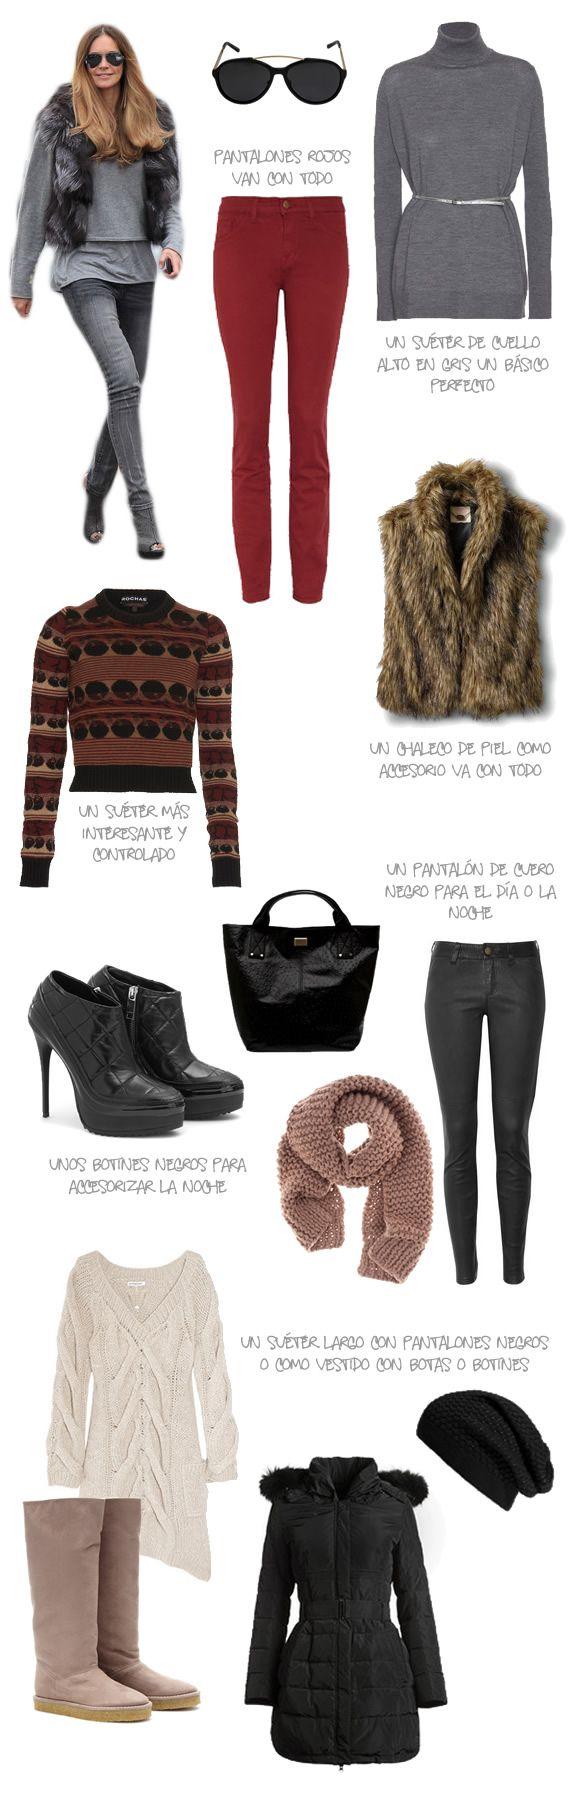 ropa para vacaciones, fashion, trends, tu trend, tutrend, ropa de mujer, ropa femenina, moda femenina,